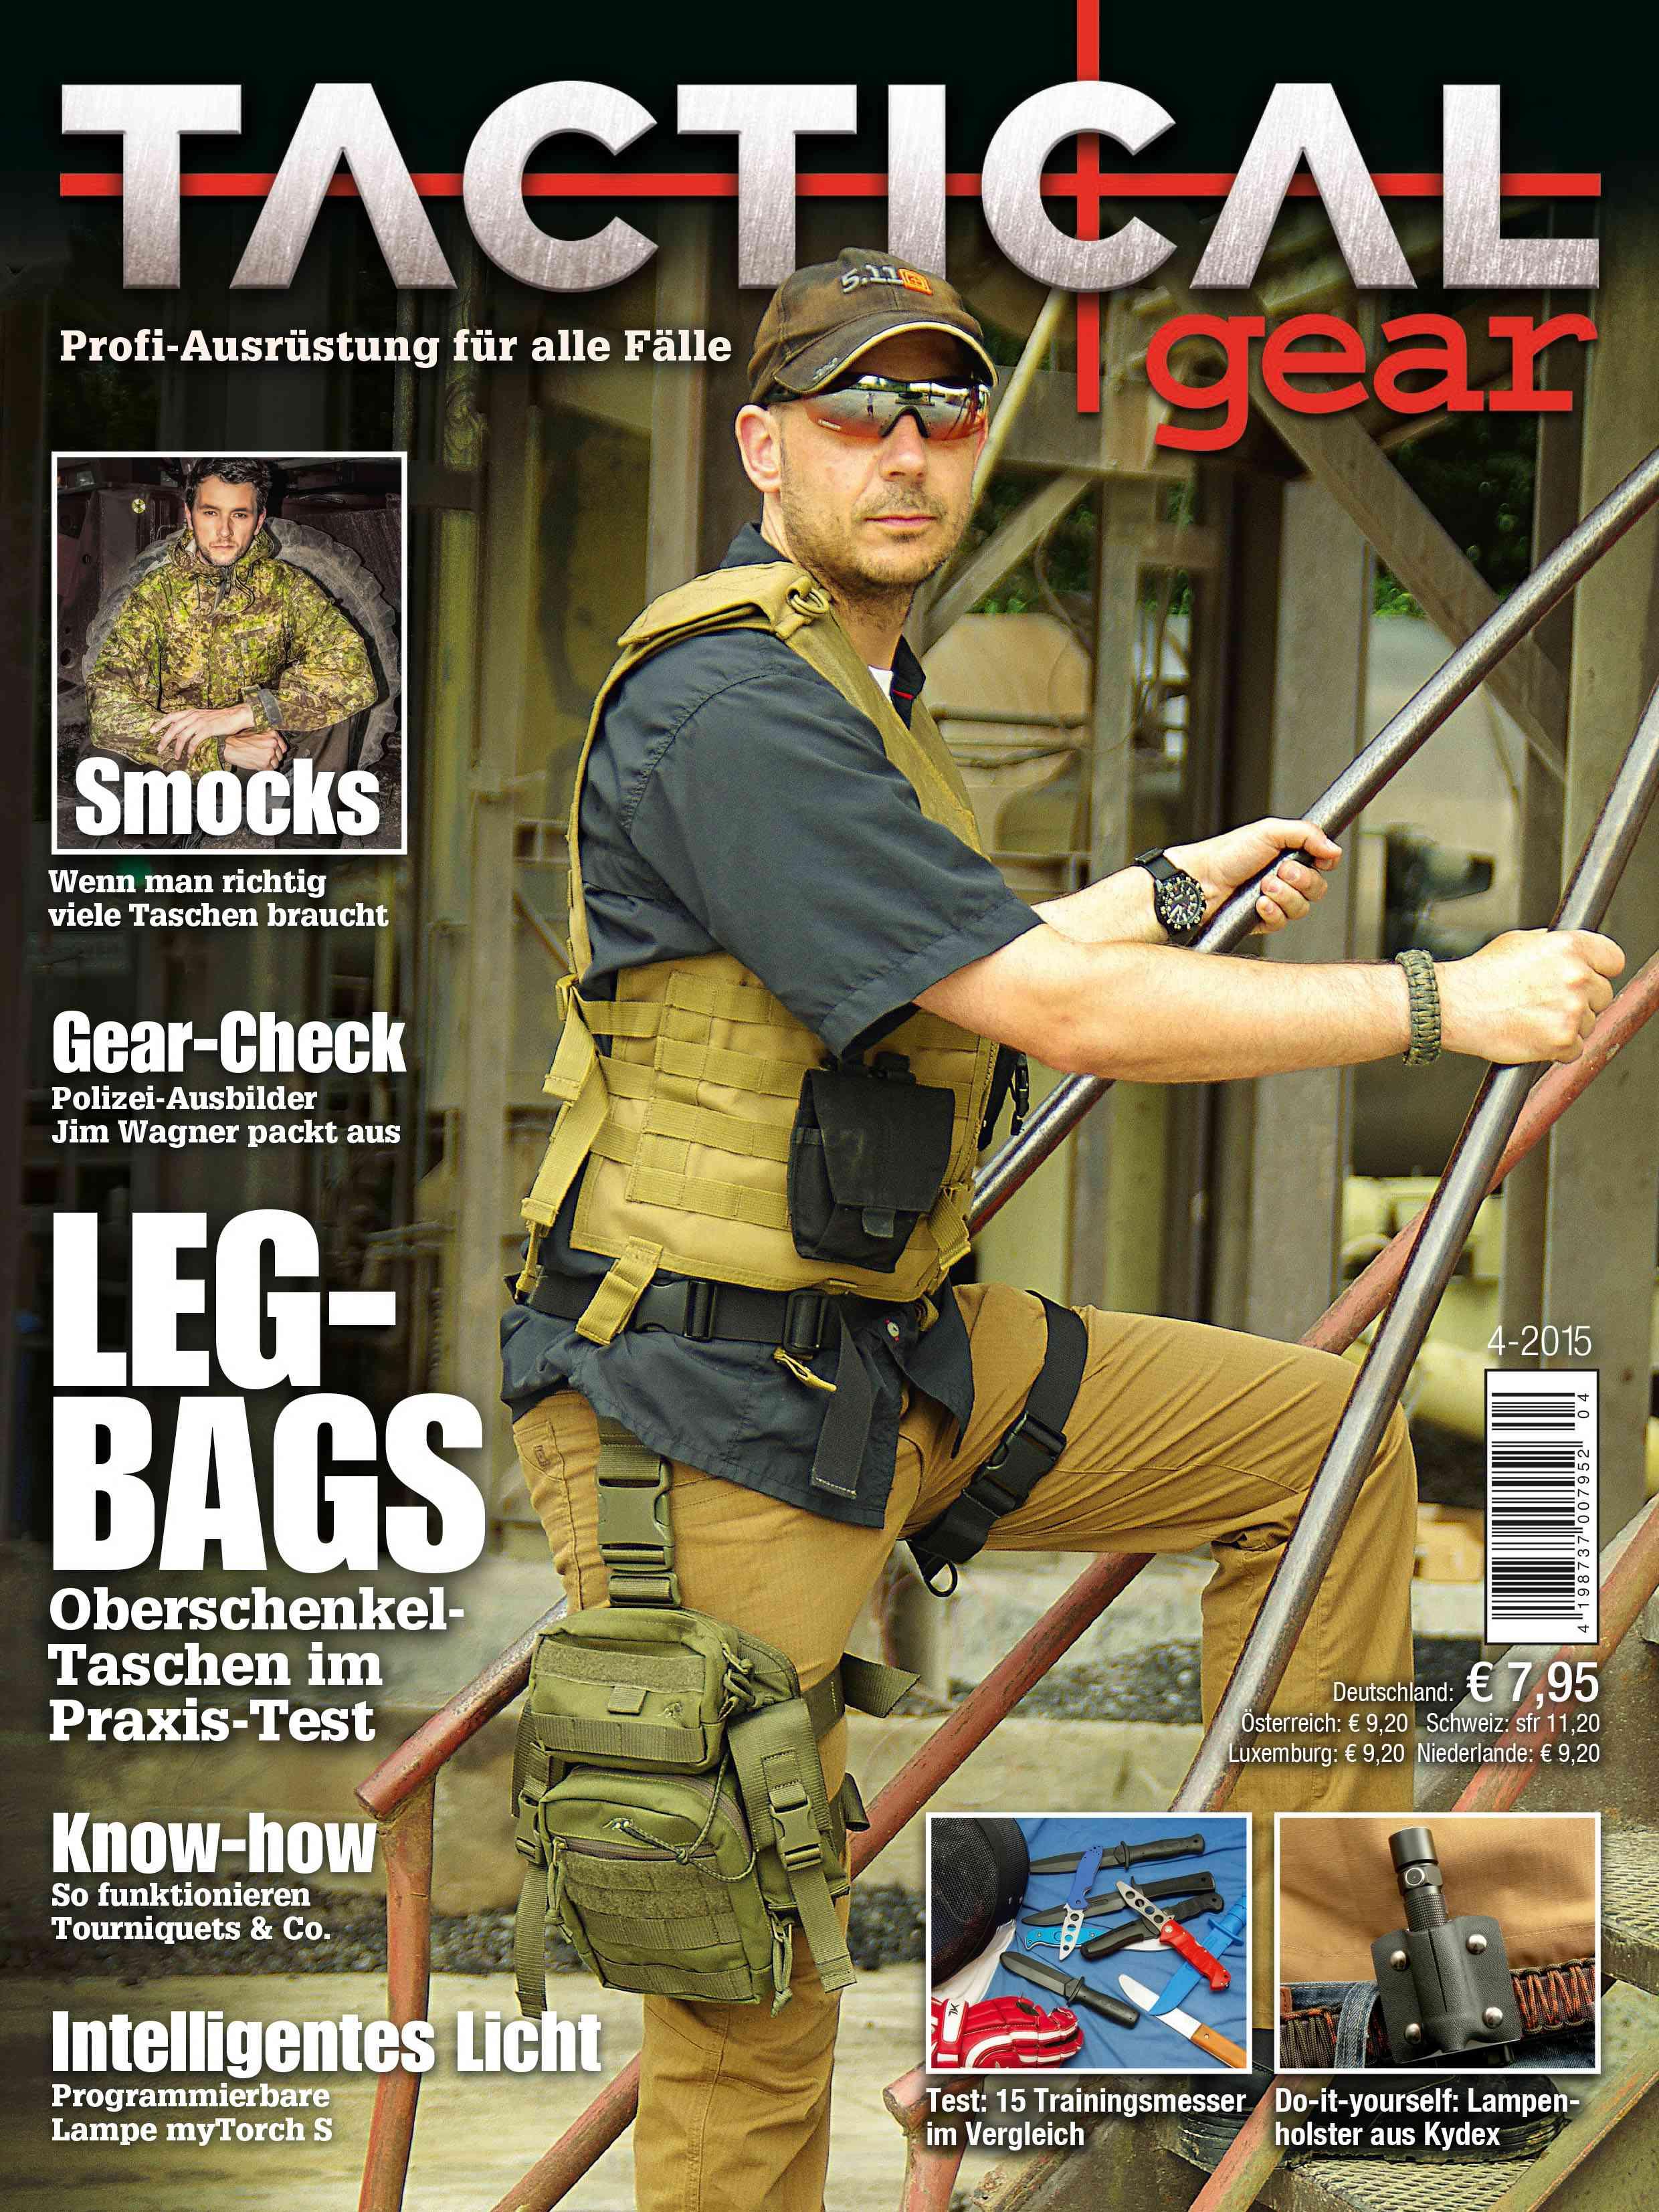 U1 Cover_Tactical_gear_4_2015.indd